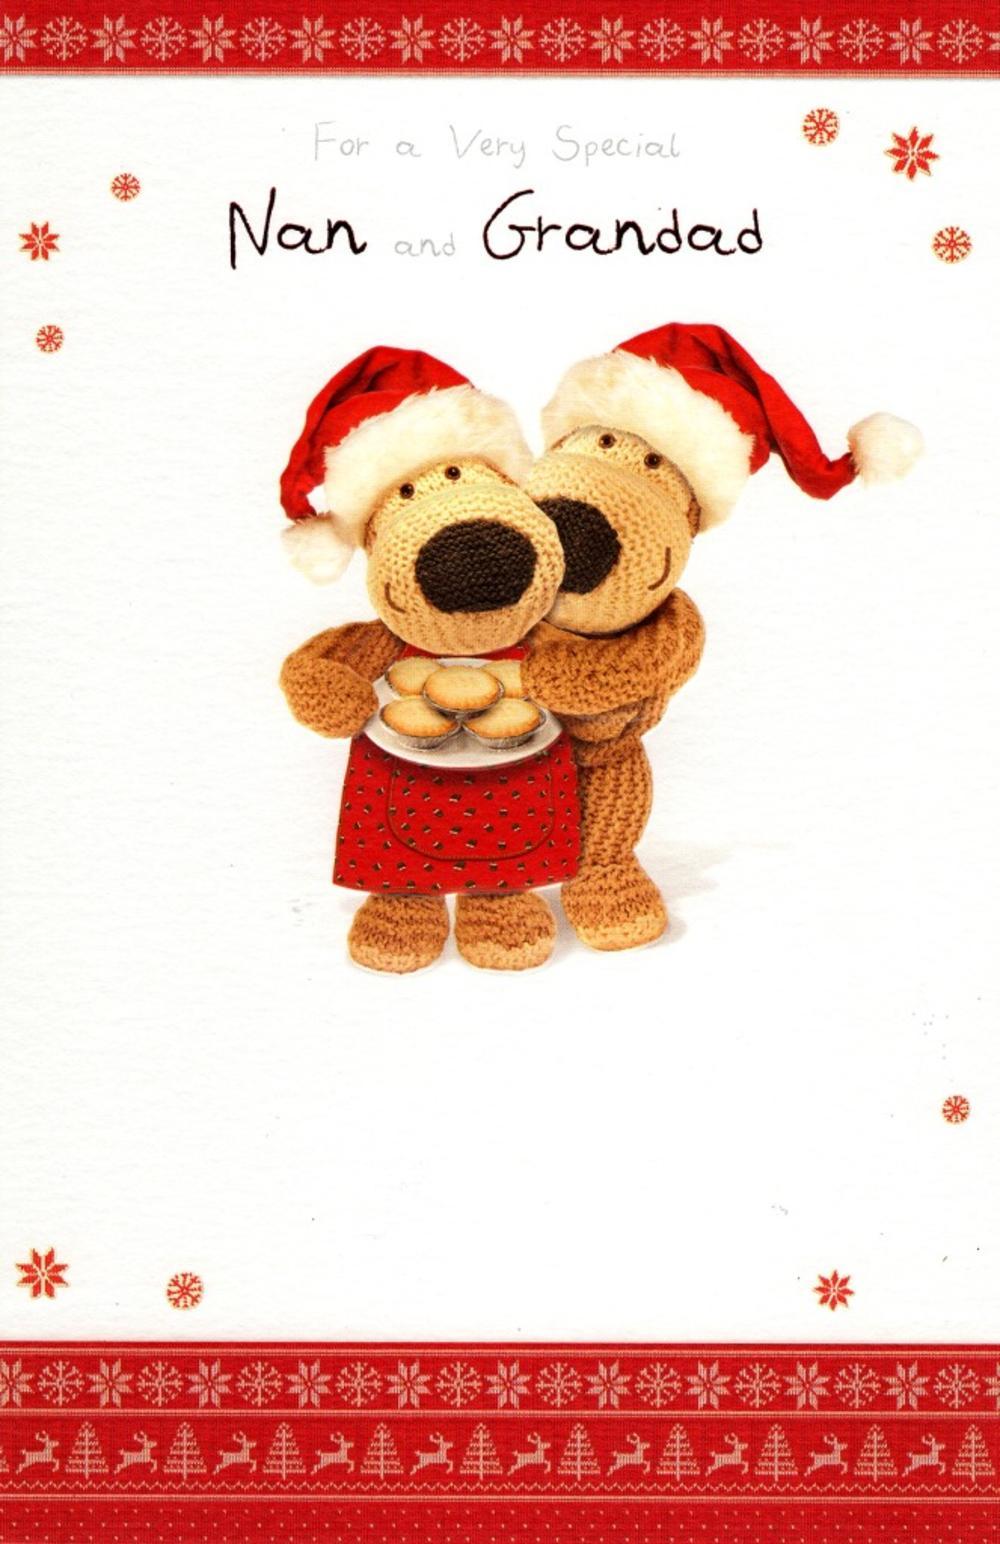 Boofle Nan & Grandad Christmas Greeting Card